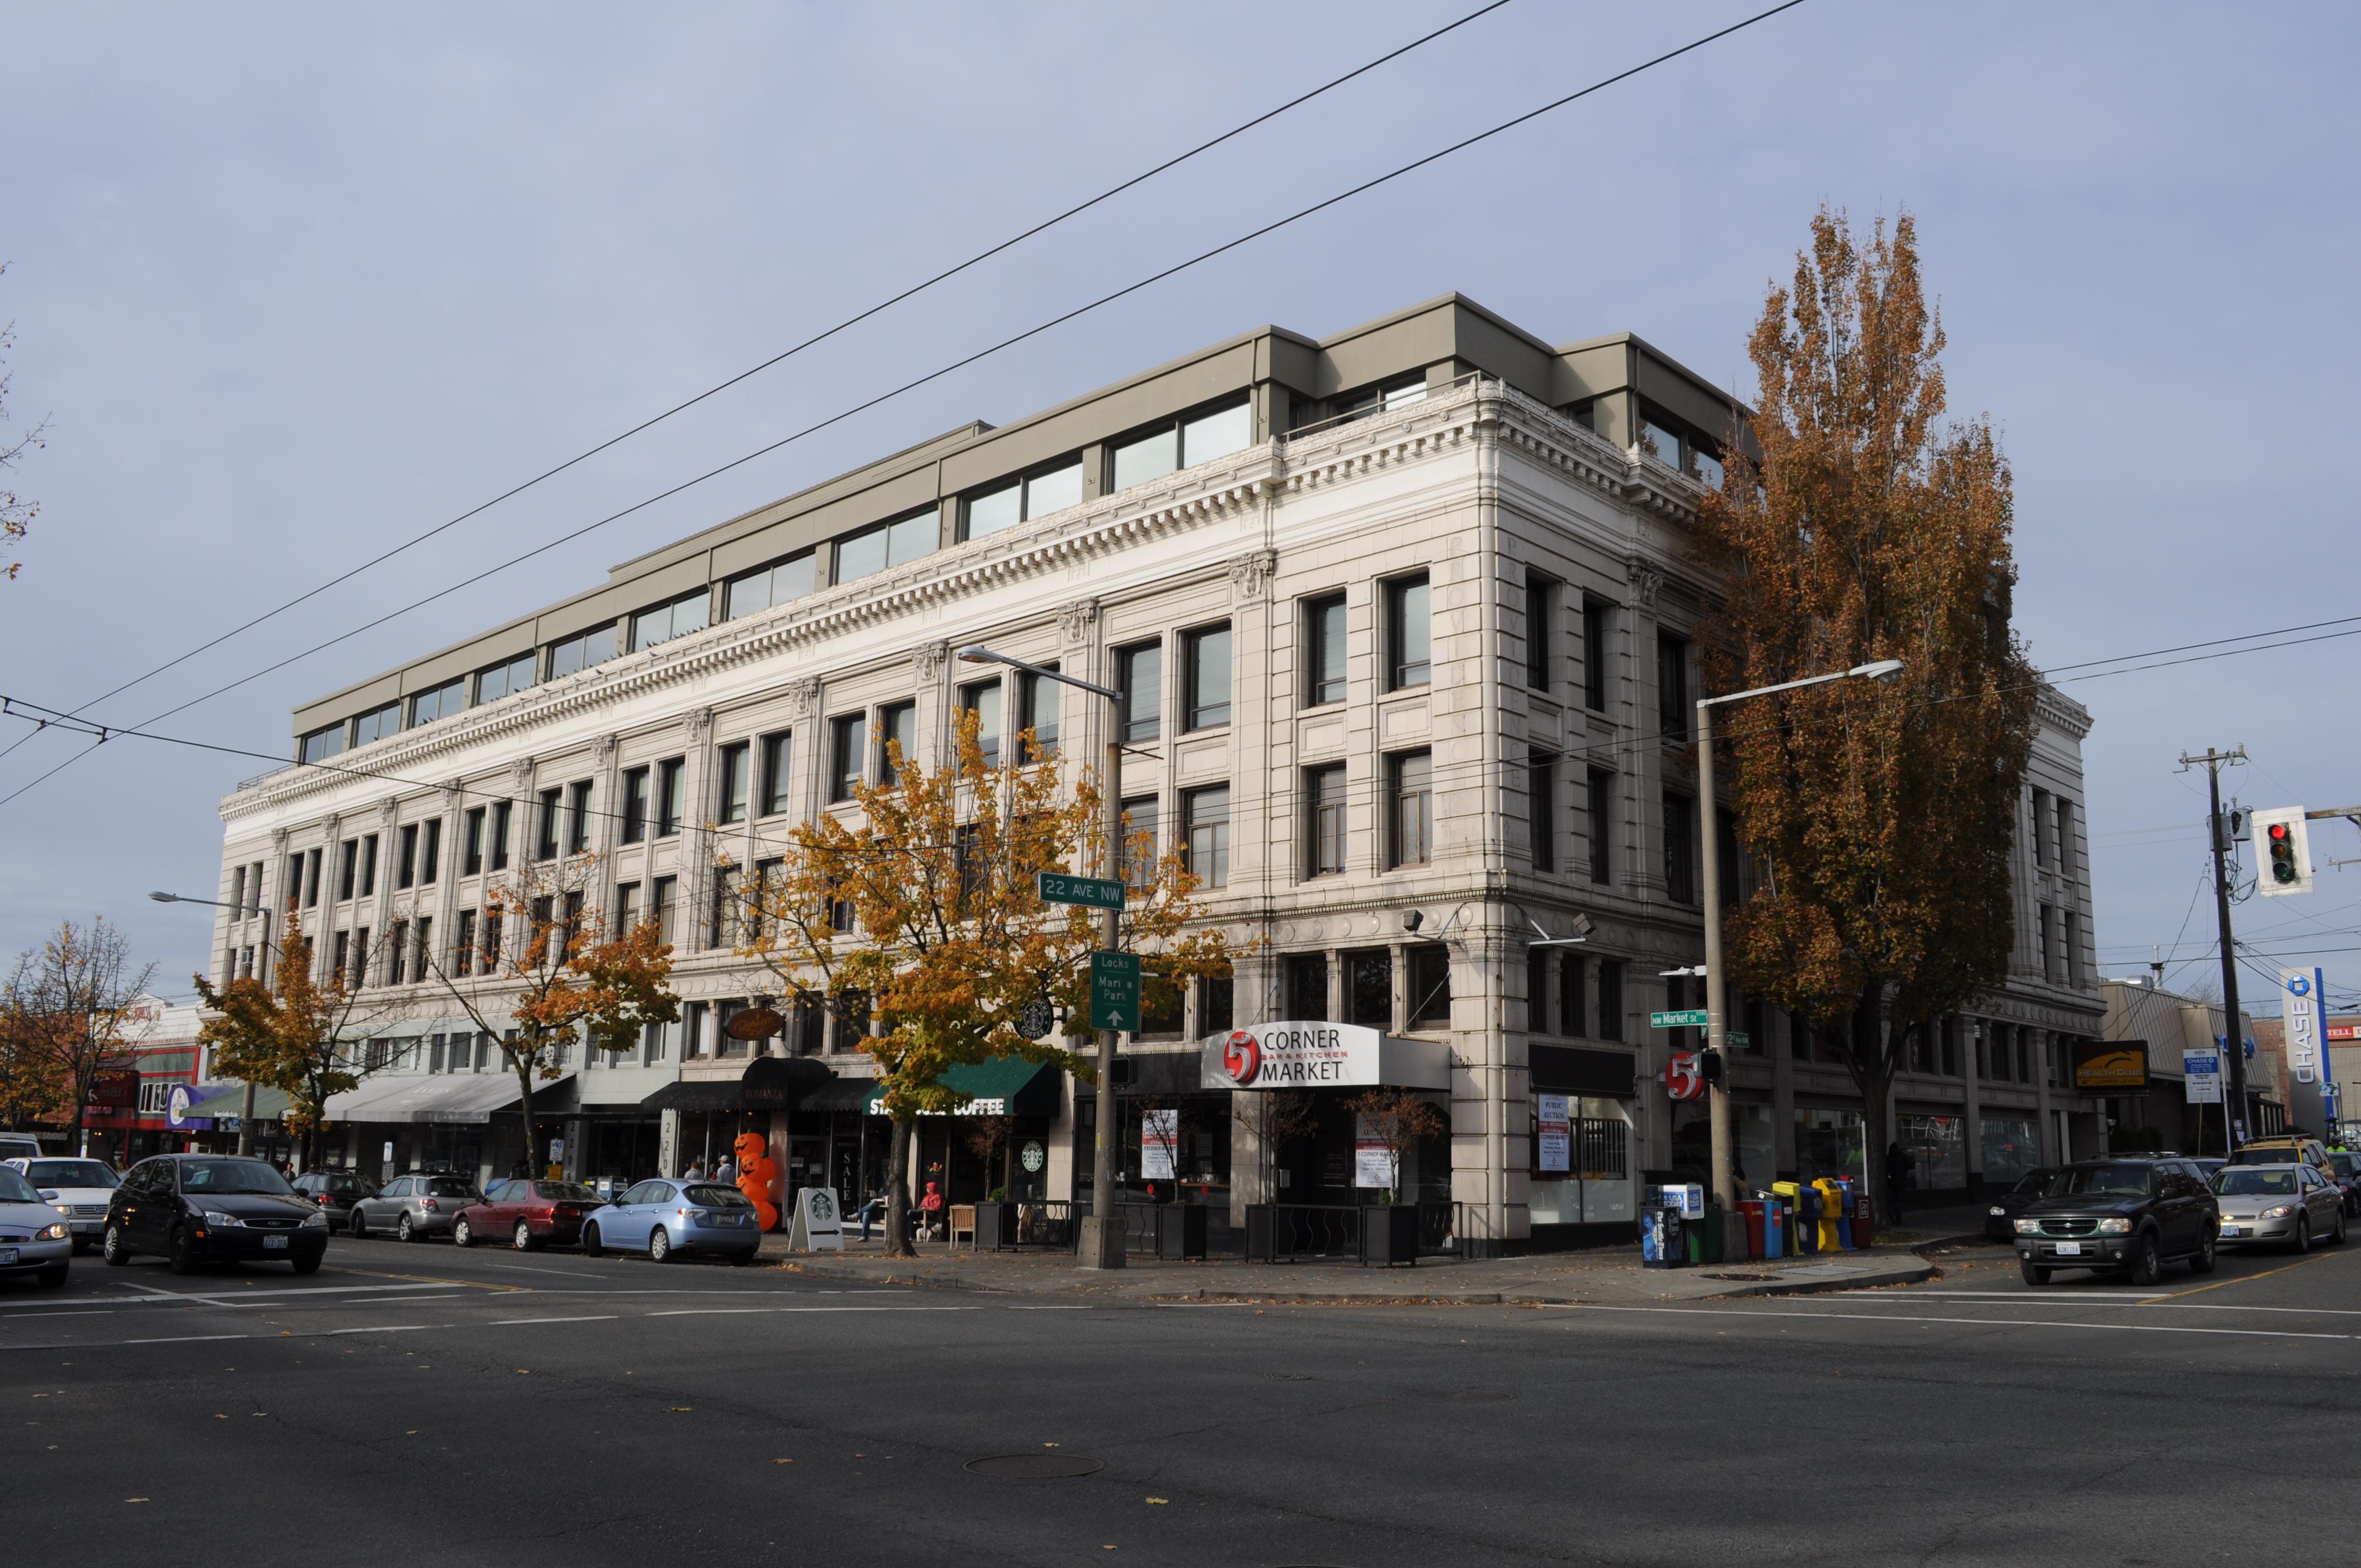 file:seattle - ballard building 01 - wikimedia commons